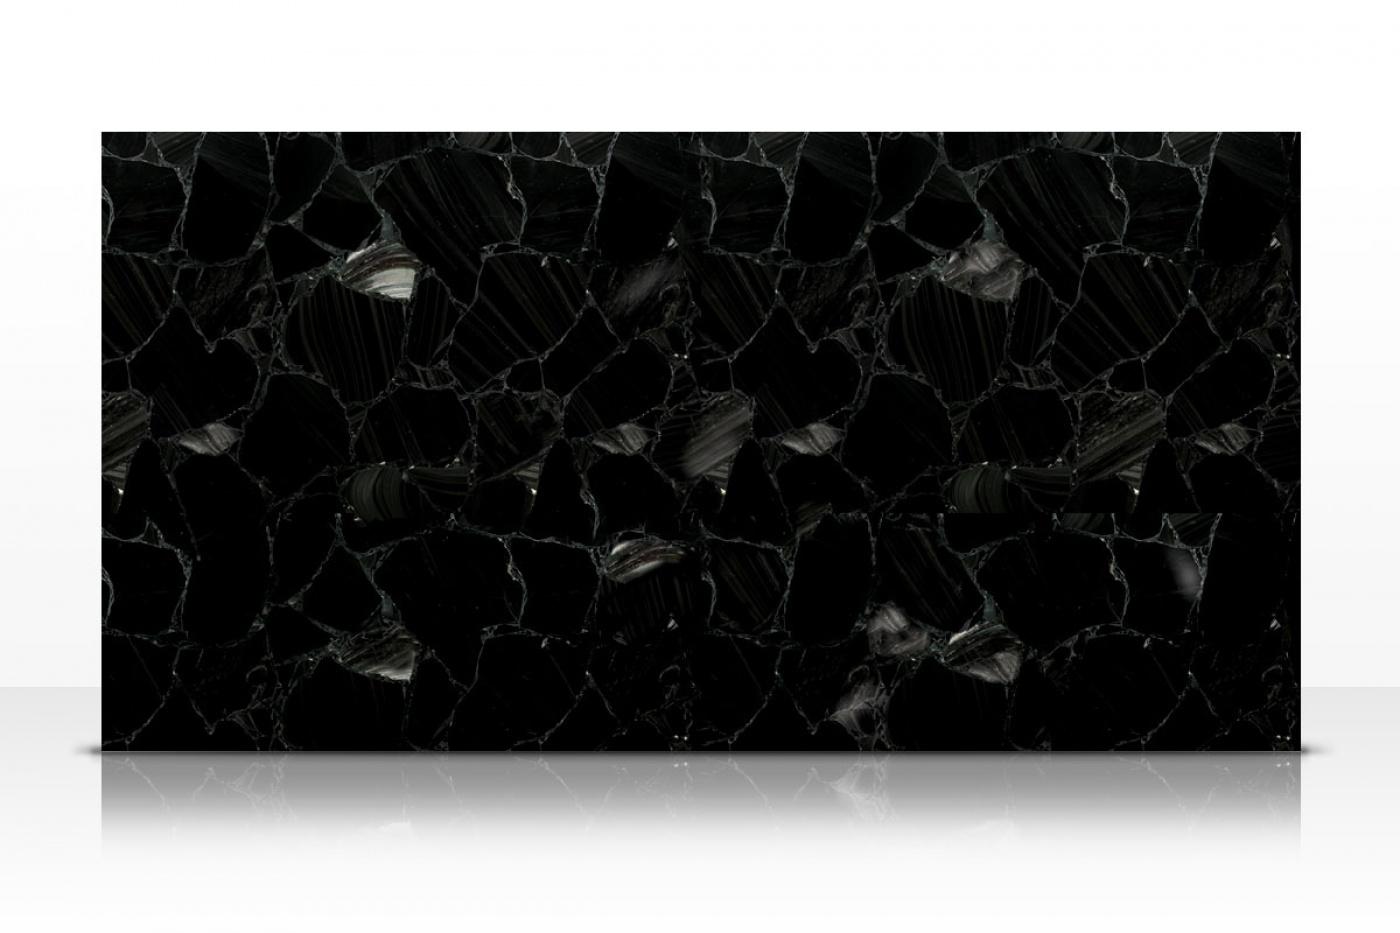 Semi-précieux Black Obsidian slab